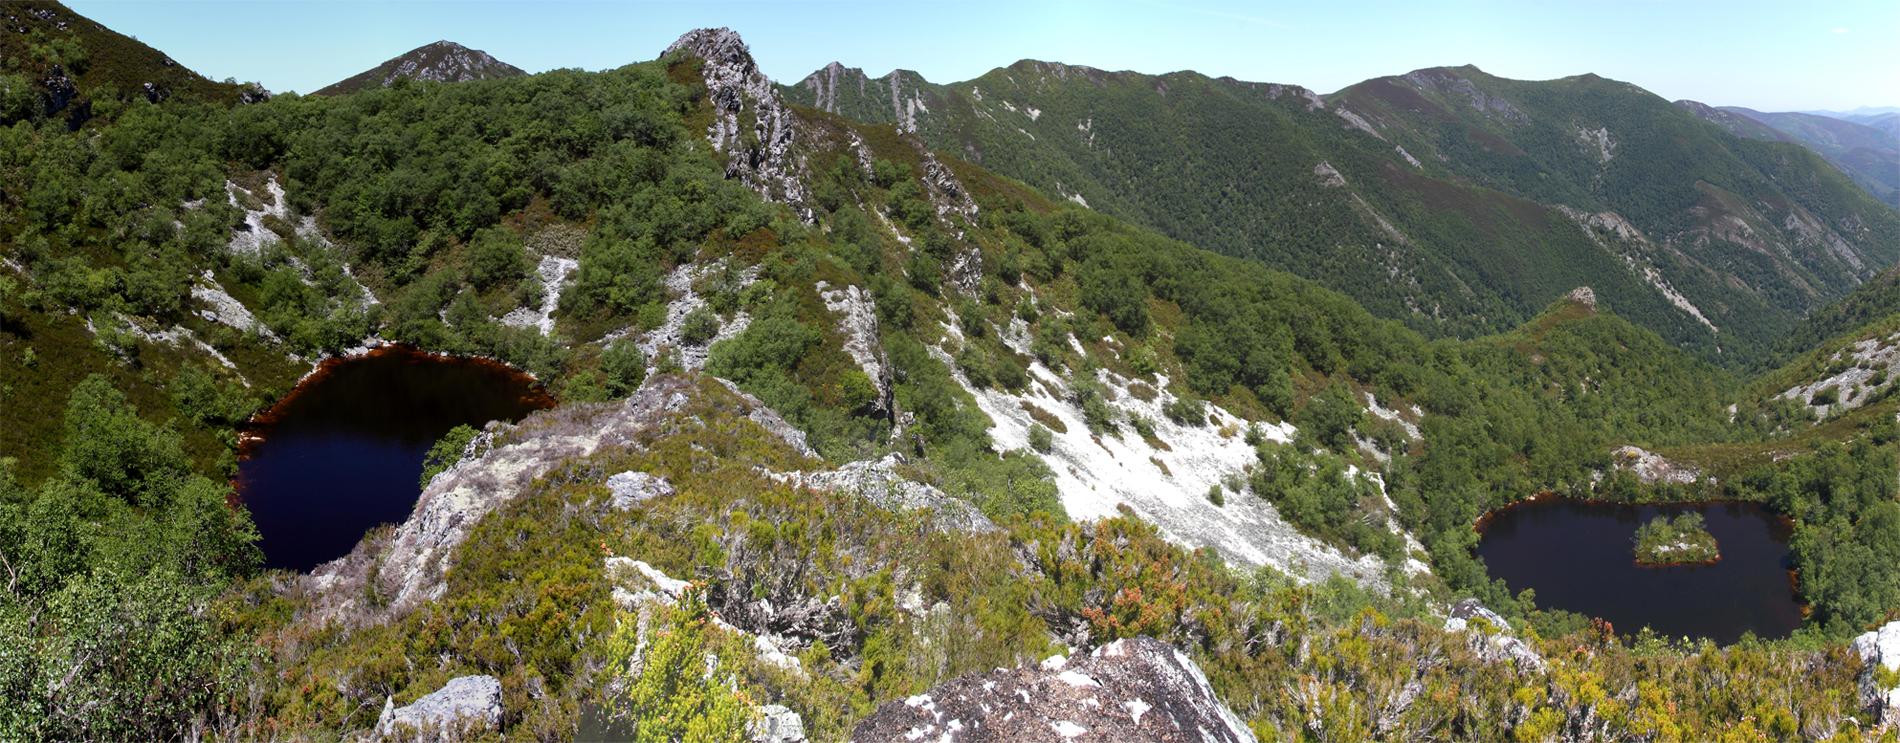 invertir en asturias reserva natural integral de muneillos housers